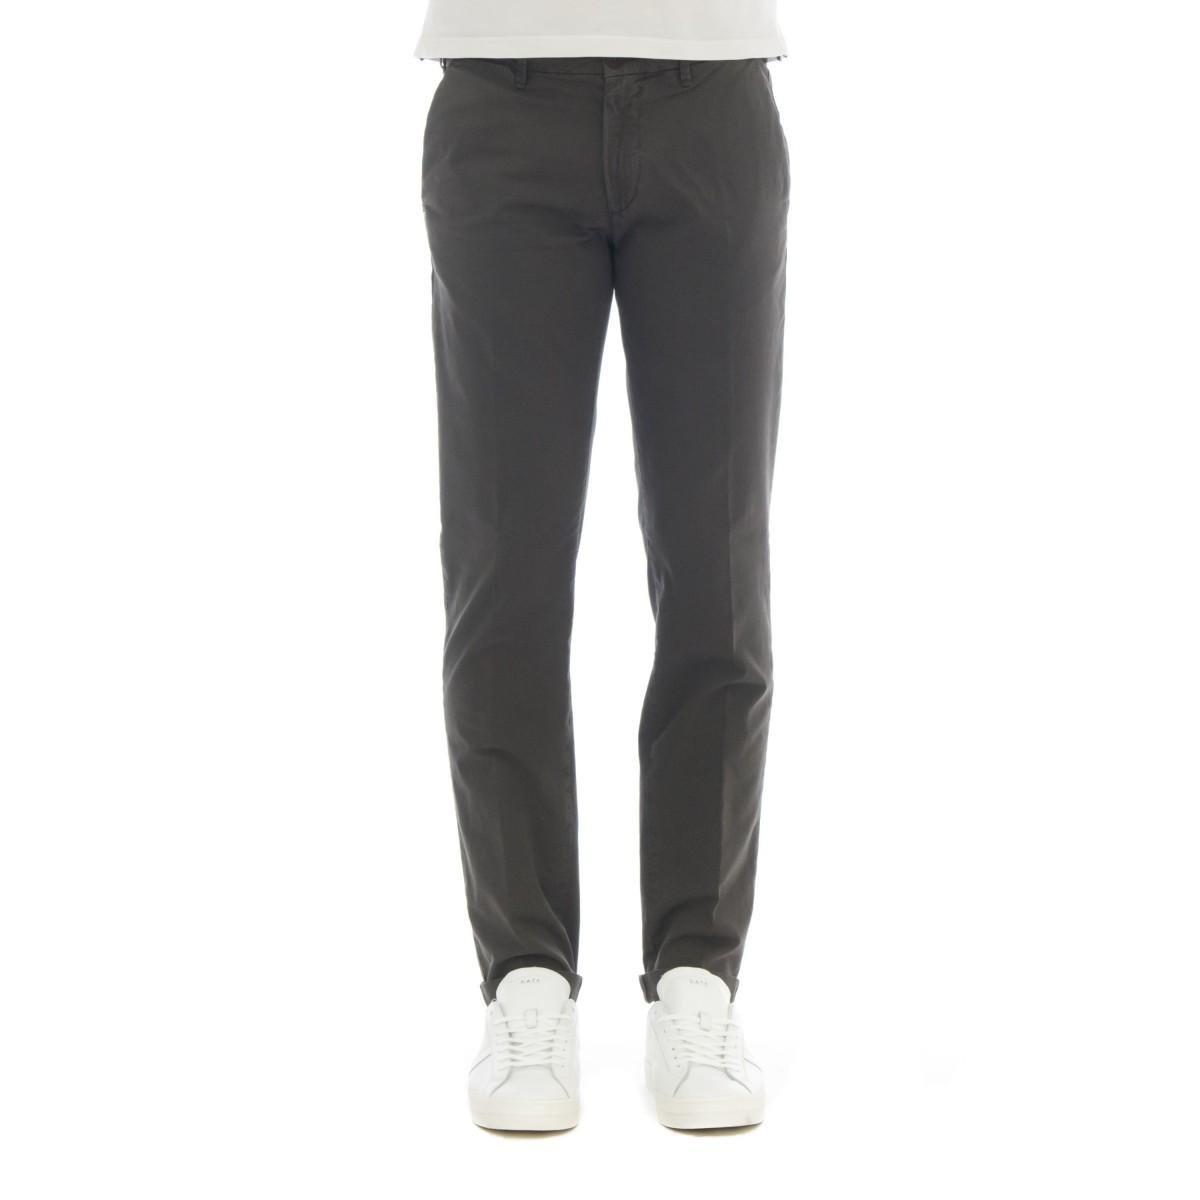 Pantalone uomo - Lenny 5600 microfantasia